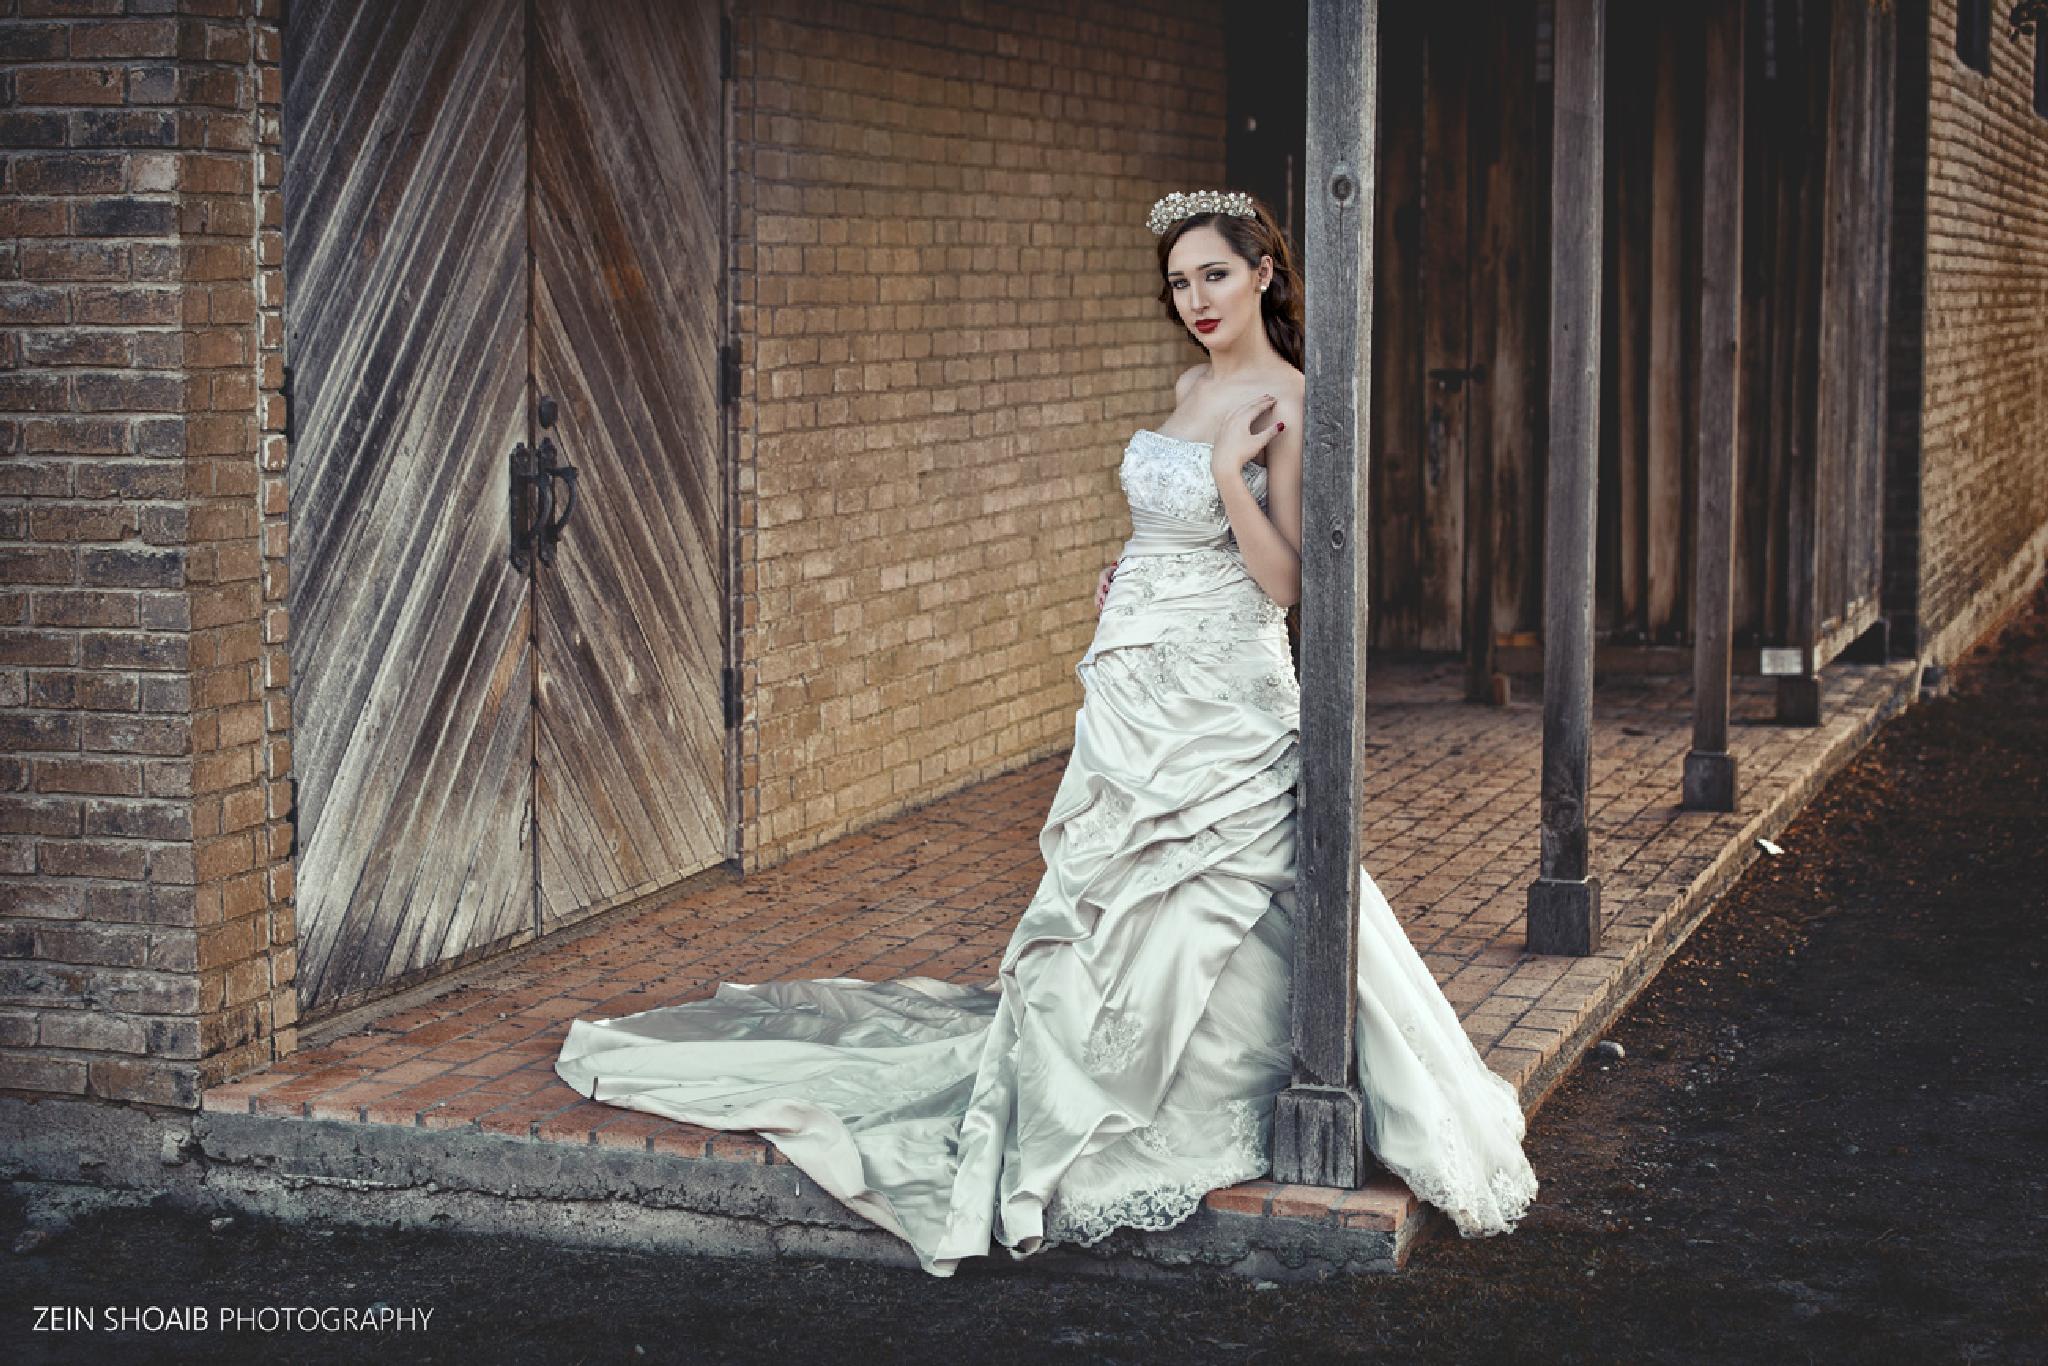 the bride [iiv] by Zein cheaib (DSLRNATION)